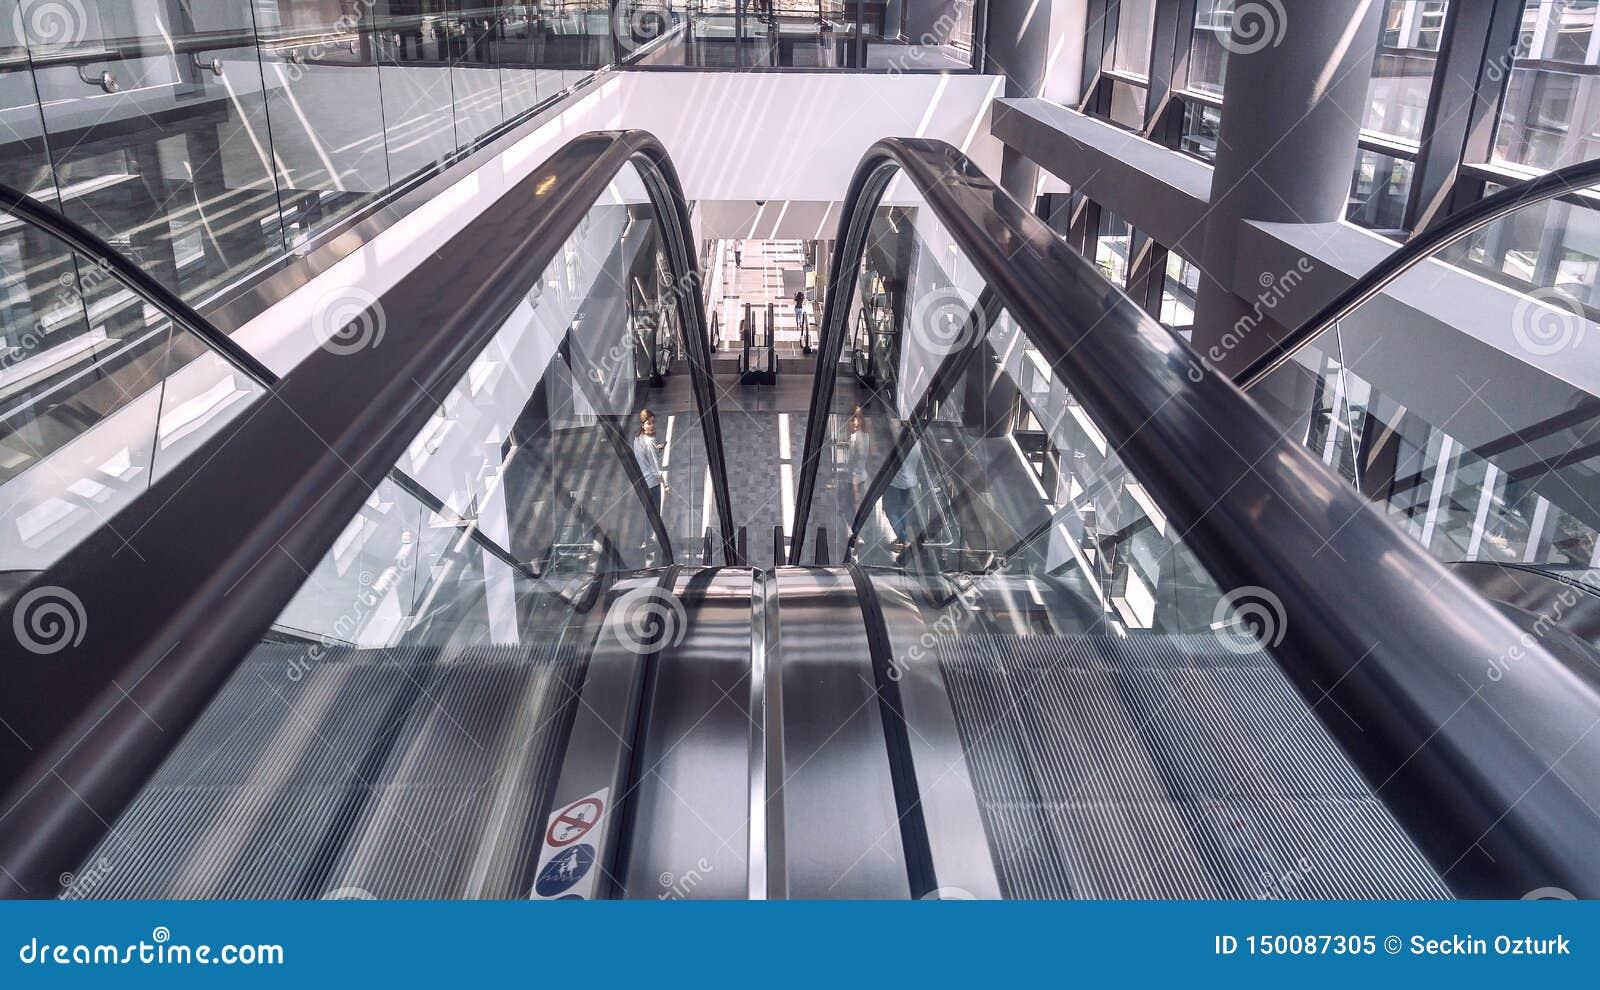 Moving escalator in interior of office building